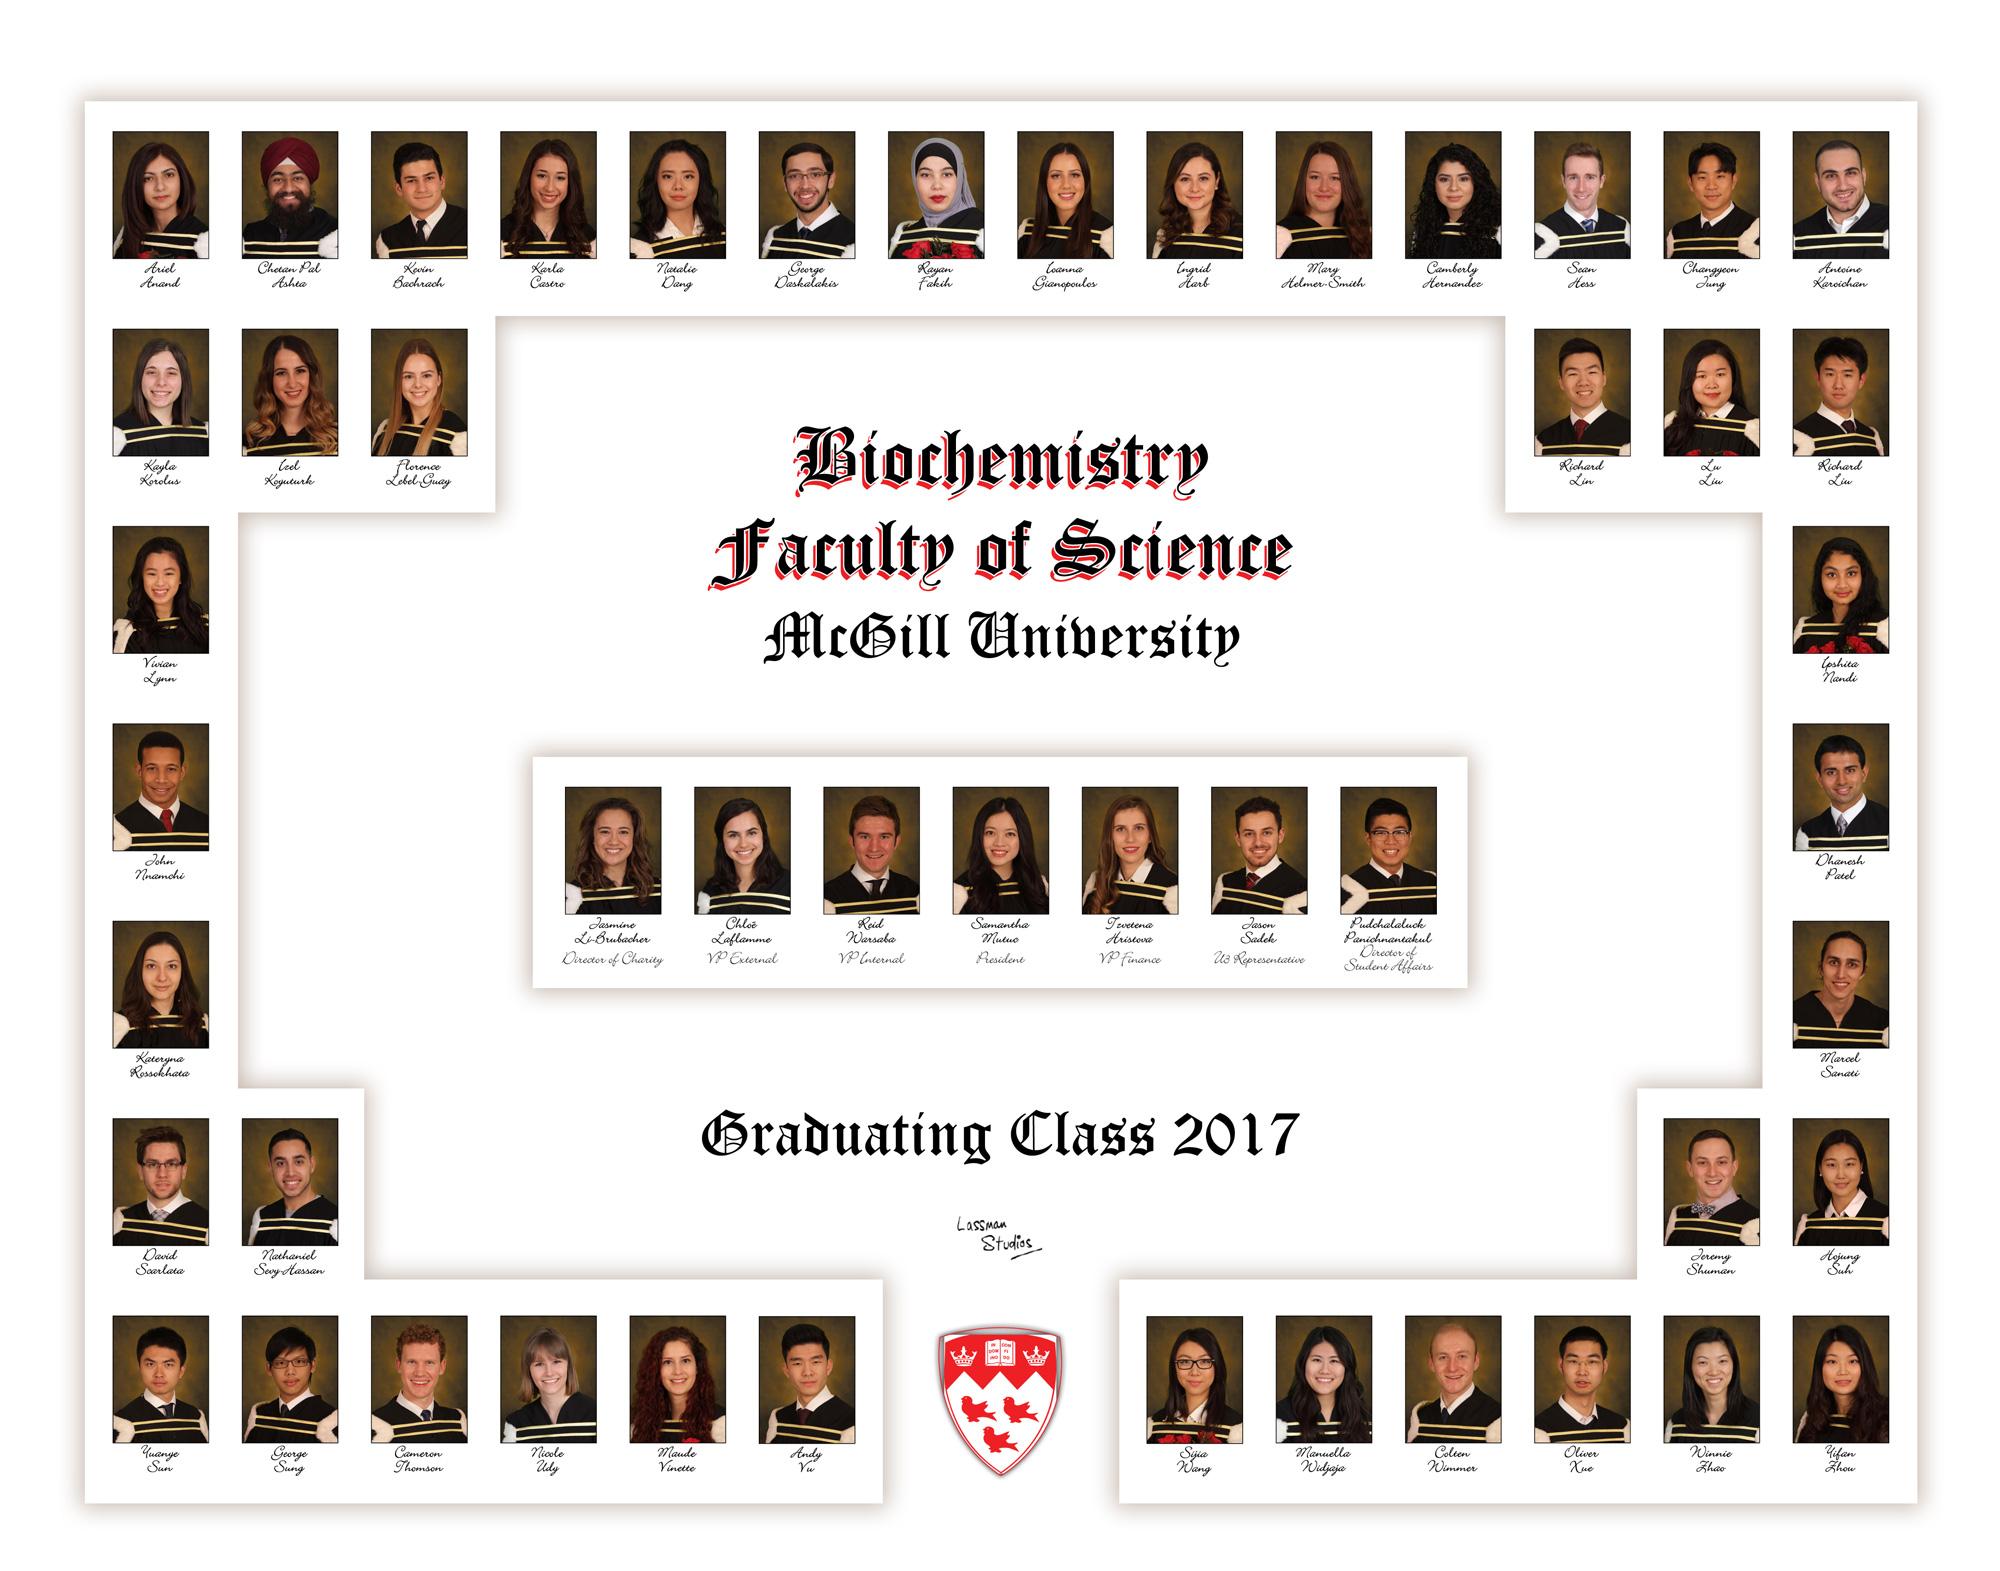 Mosaics-2017-Biochemistry